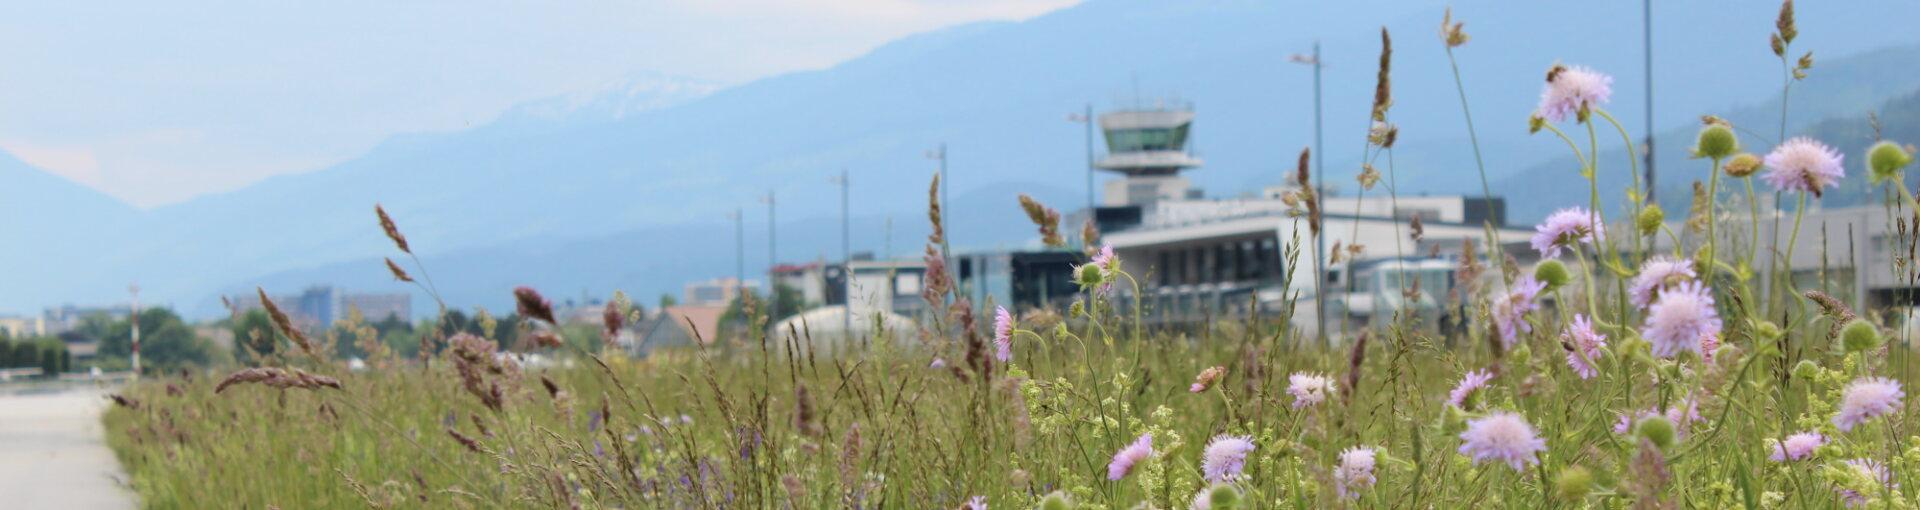 Flughafen Innsbruck © Michael Hermann